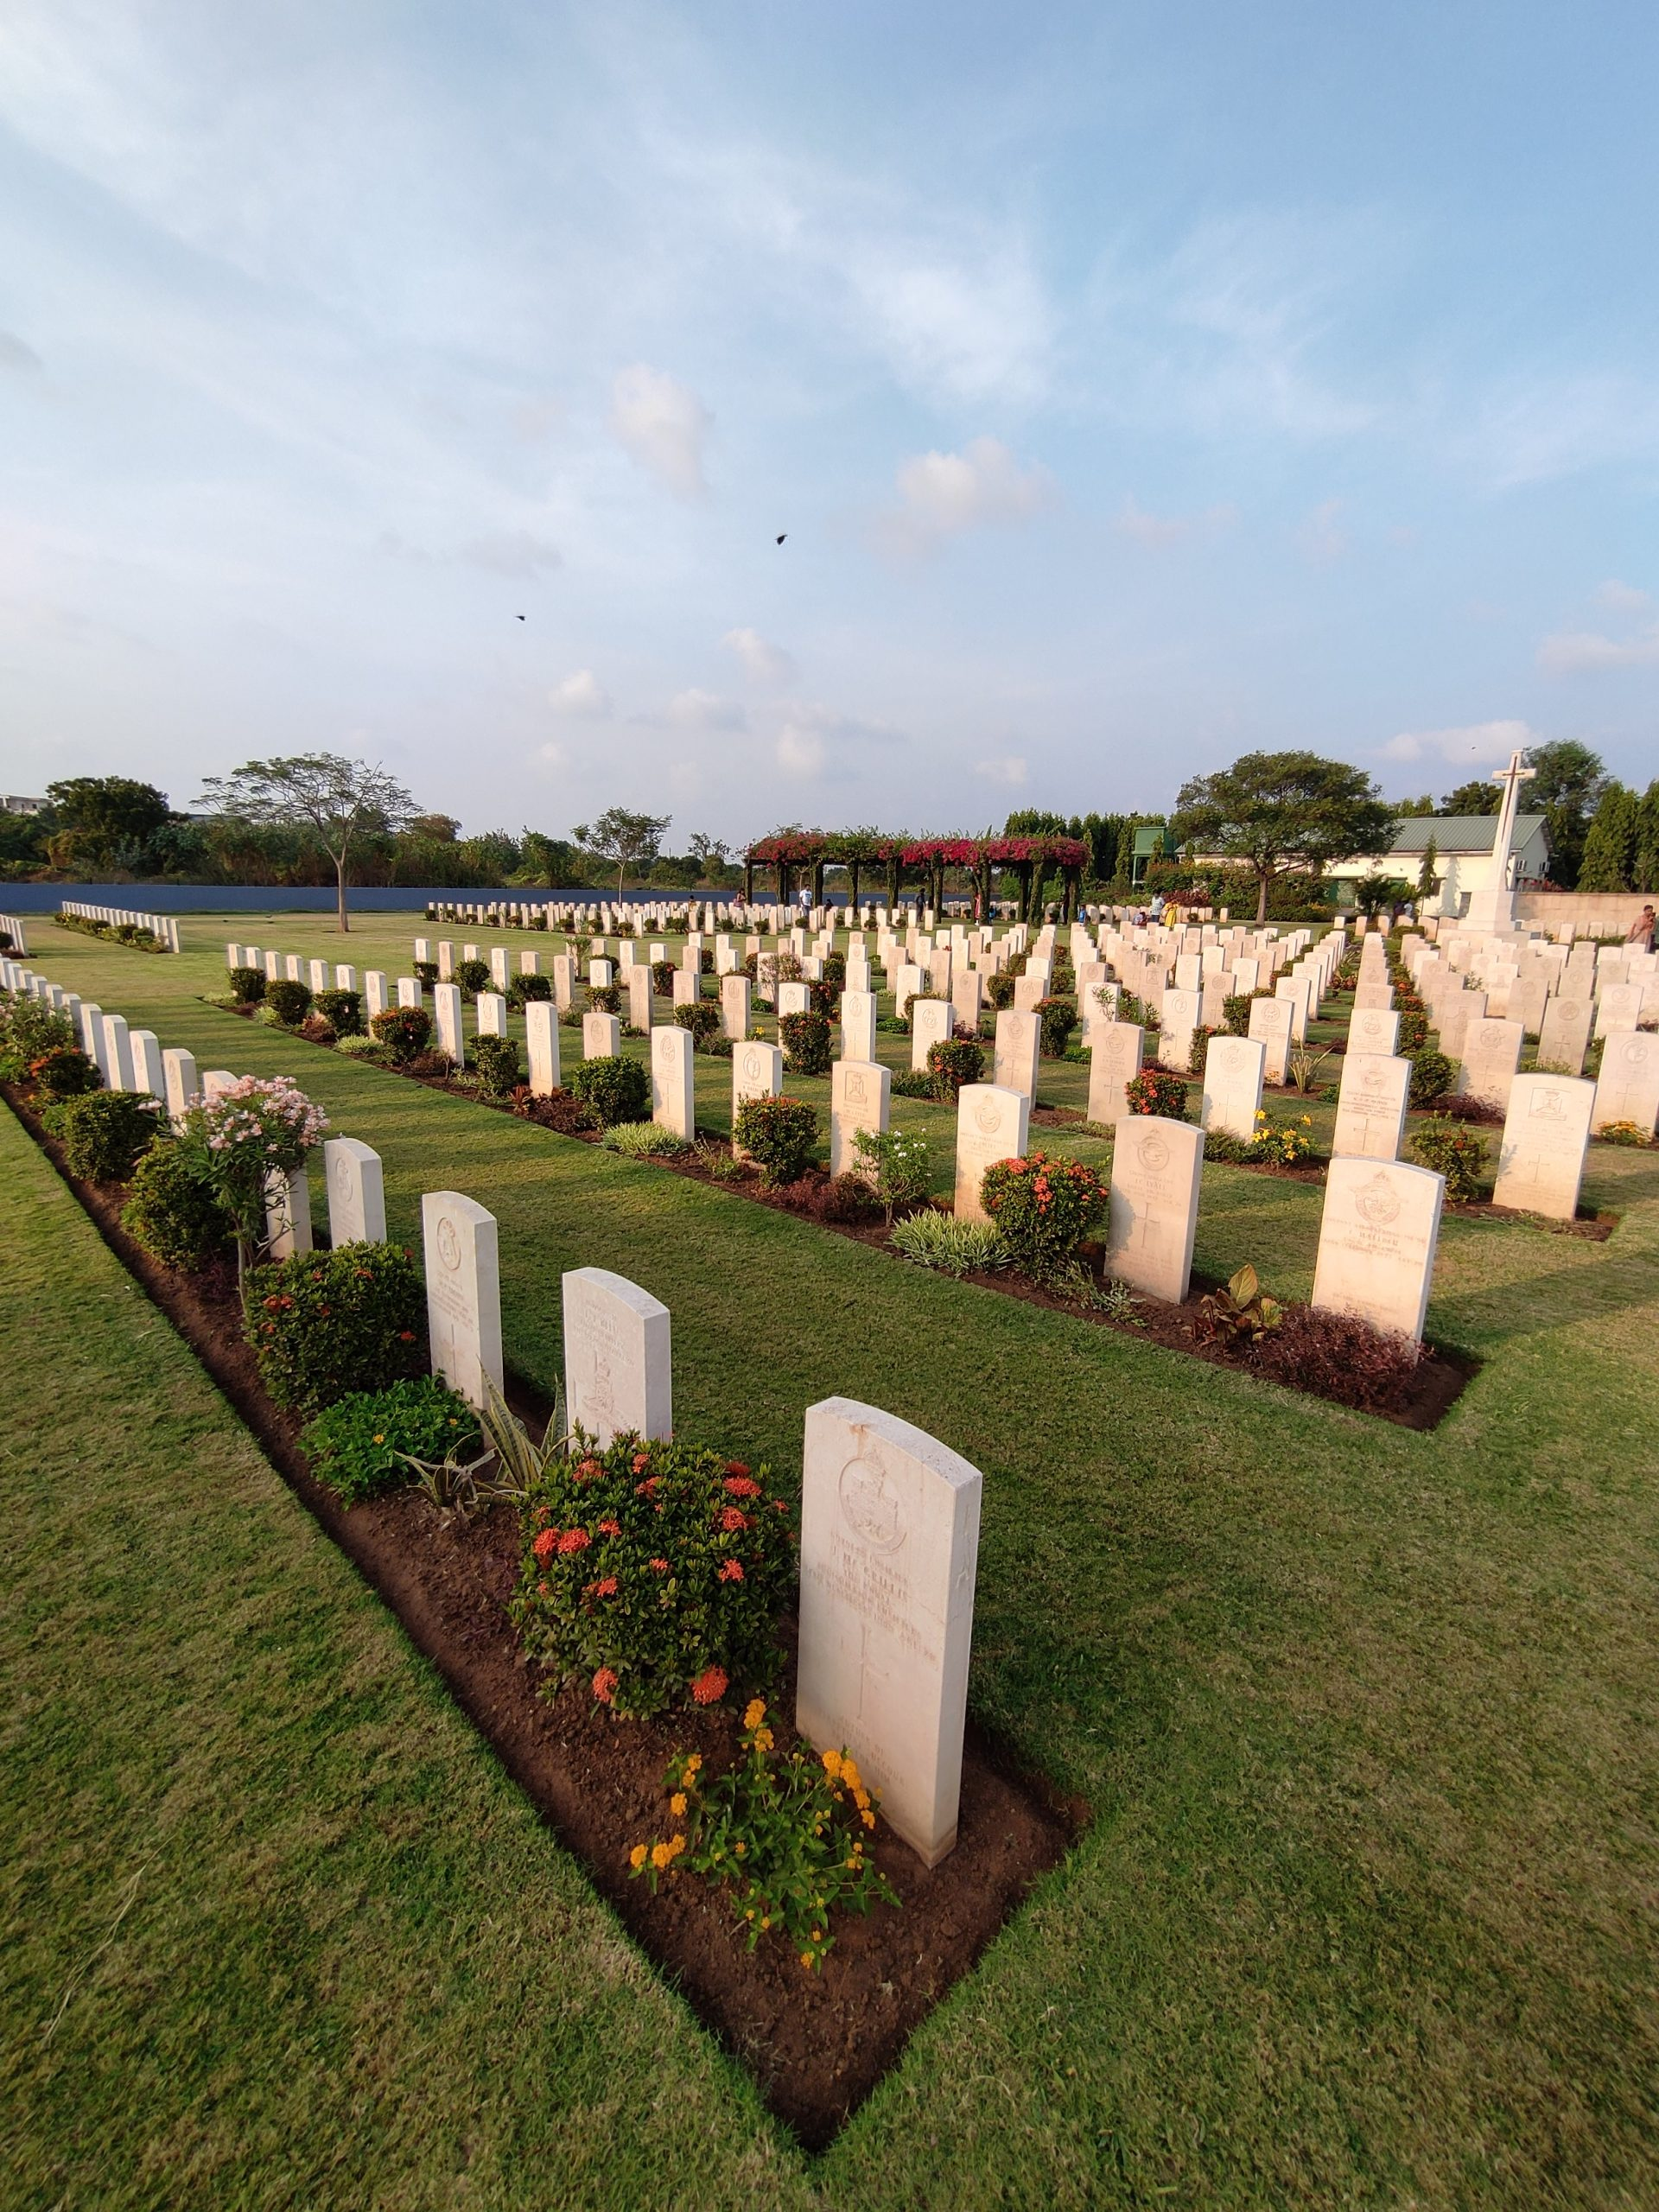 Madras War Memorial in Chennai Landscape